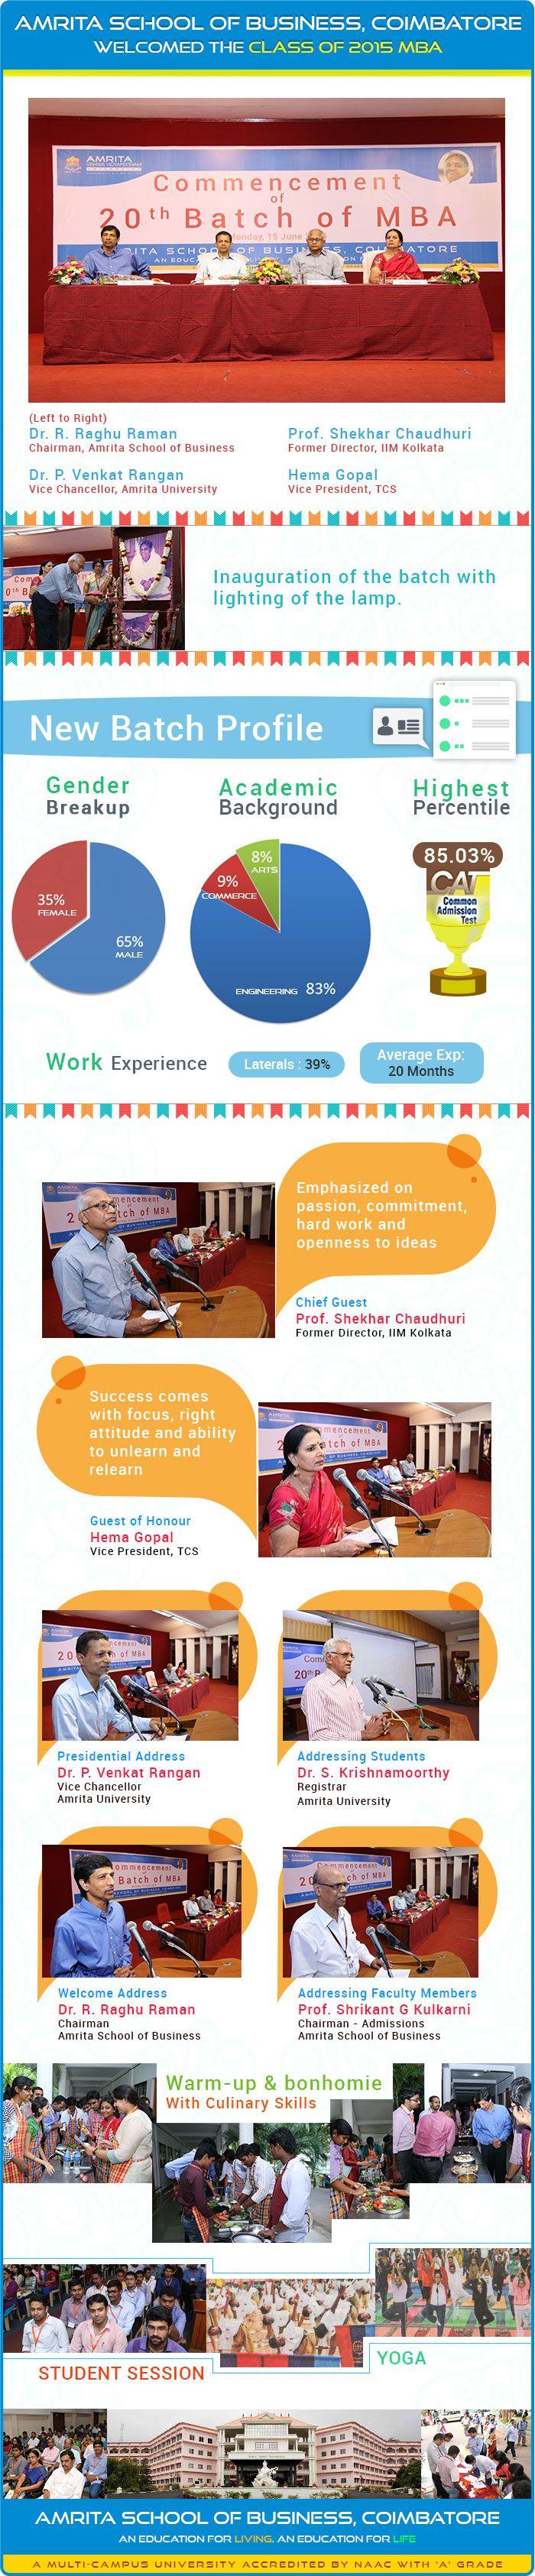 Amrita School of Business (ASB) of Amrita Vishwa Vidyapeetham inaugurated its 20th  batch of fulltime MBA programme on June 15. The new batch has 125 students.